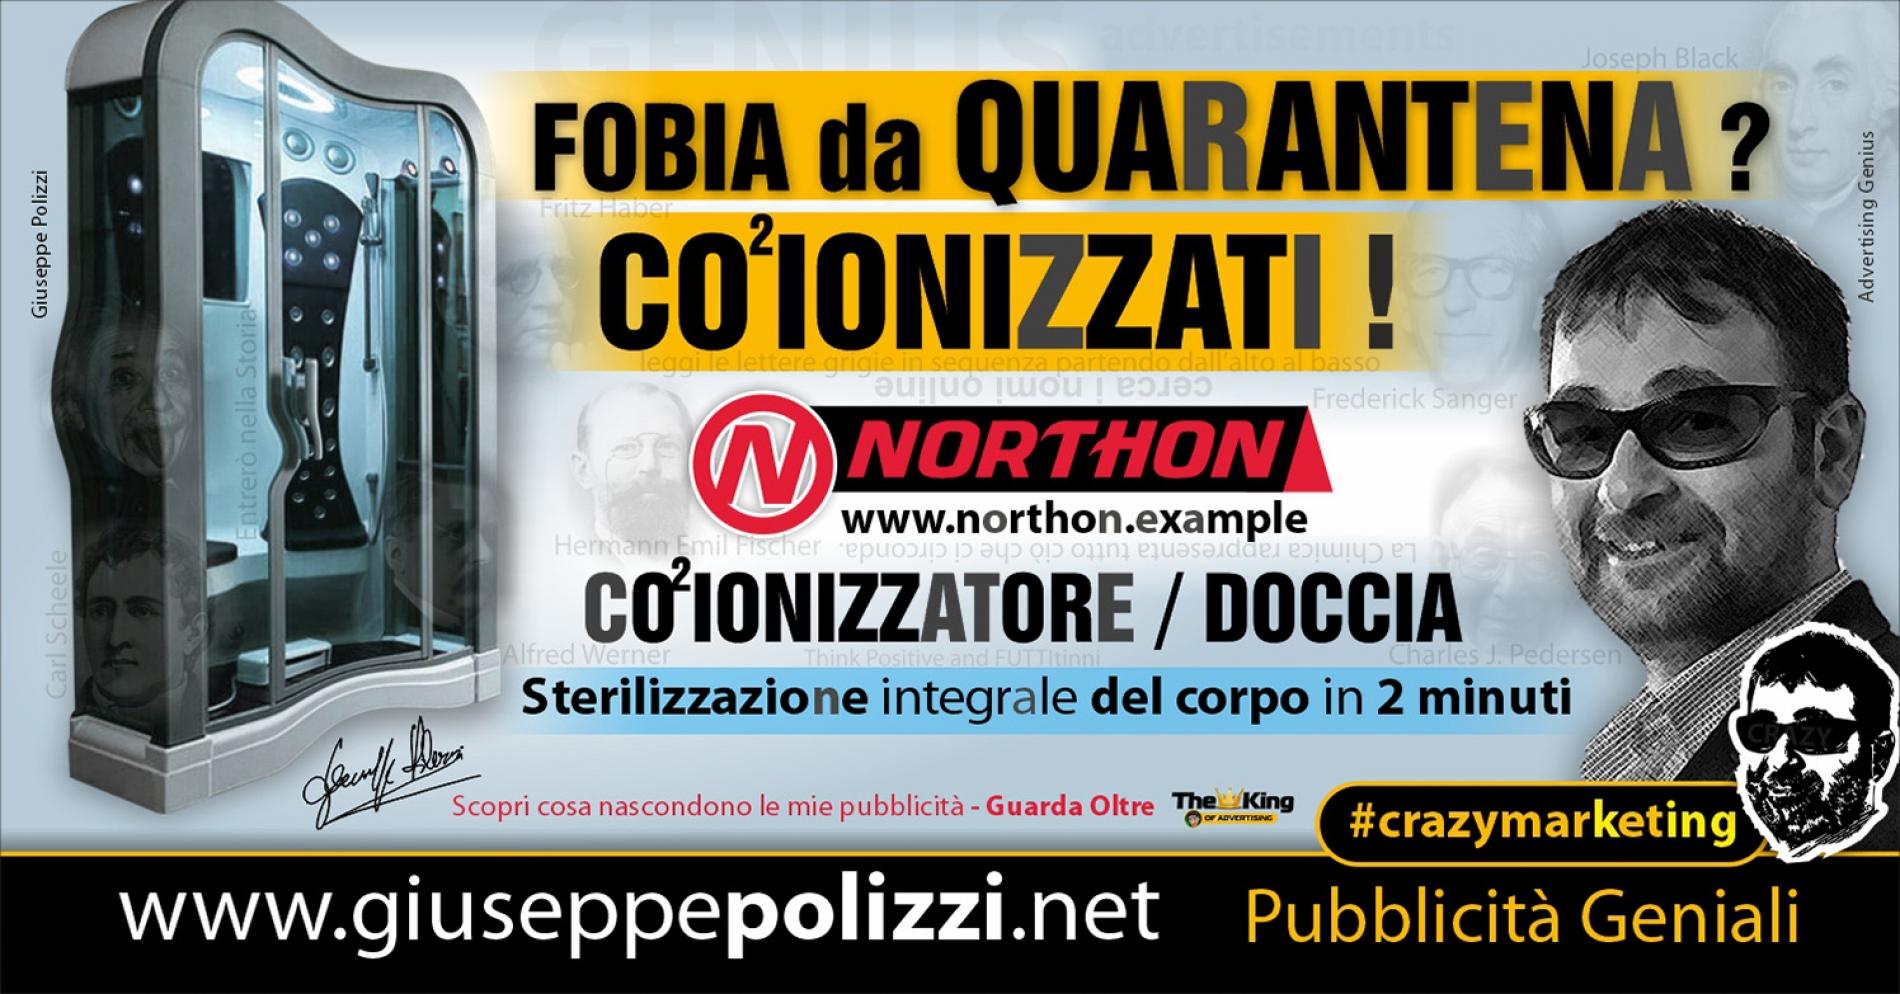 giuseppe polizzi pubblicità Fobia da quarantena Crazy Marketing  2020